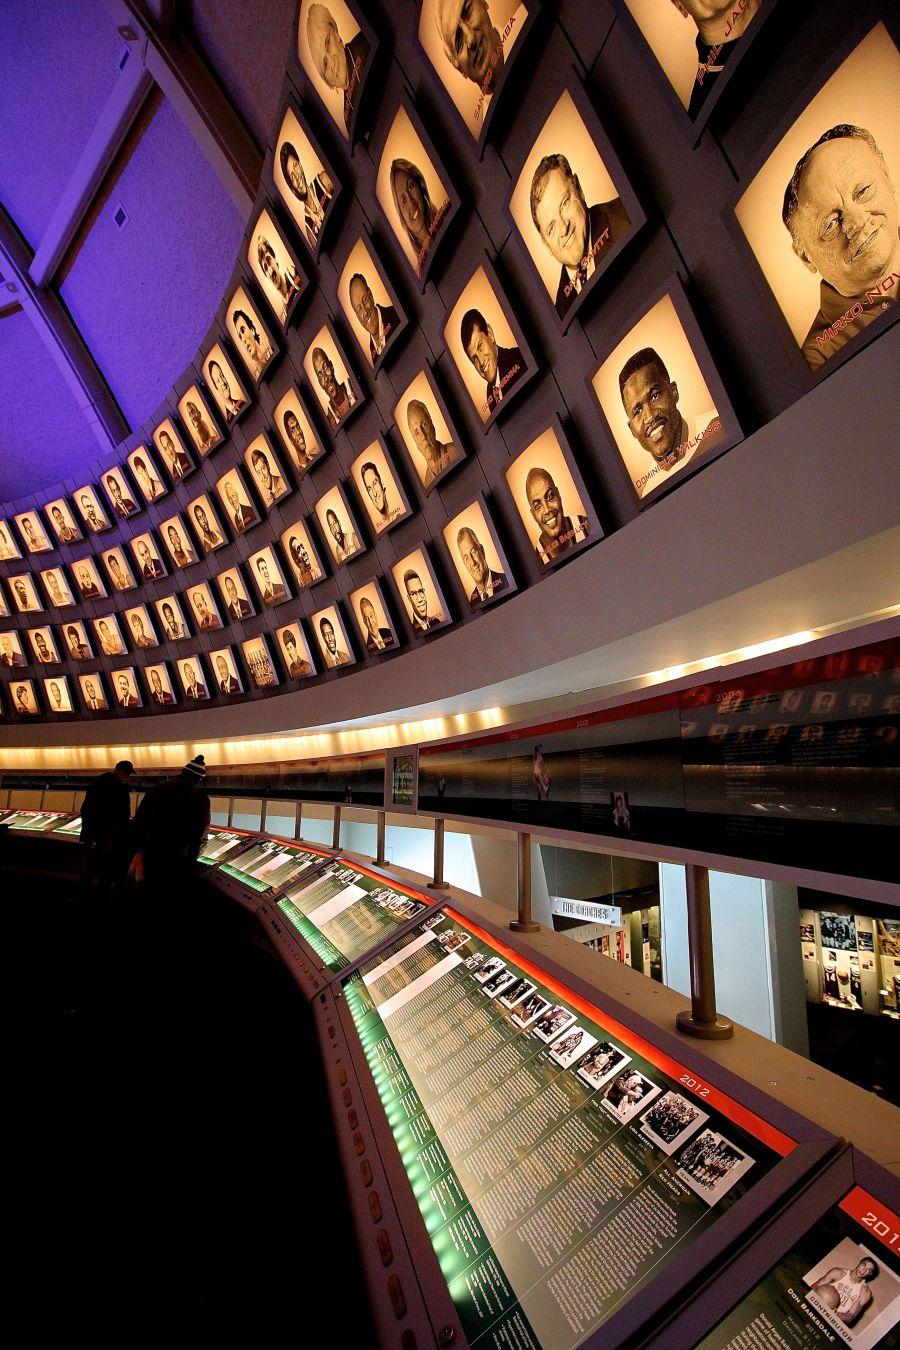 Springfield Naismith Memorial Basketball Hall of Fame hall of fame portraits and biographies